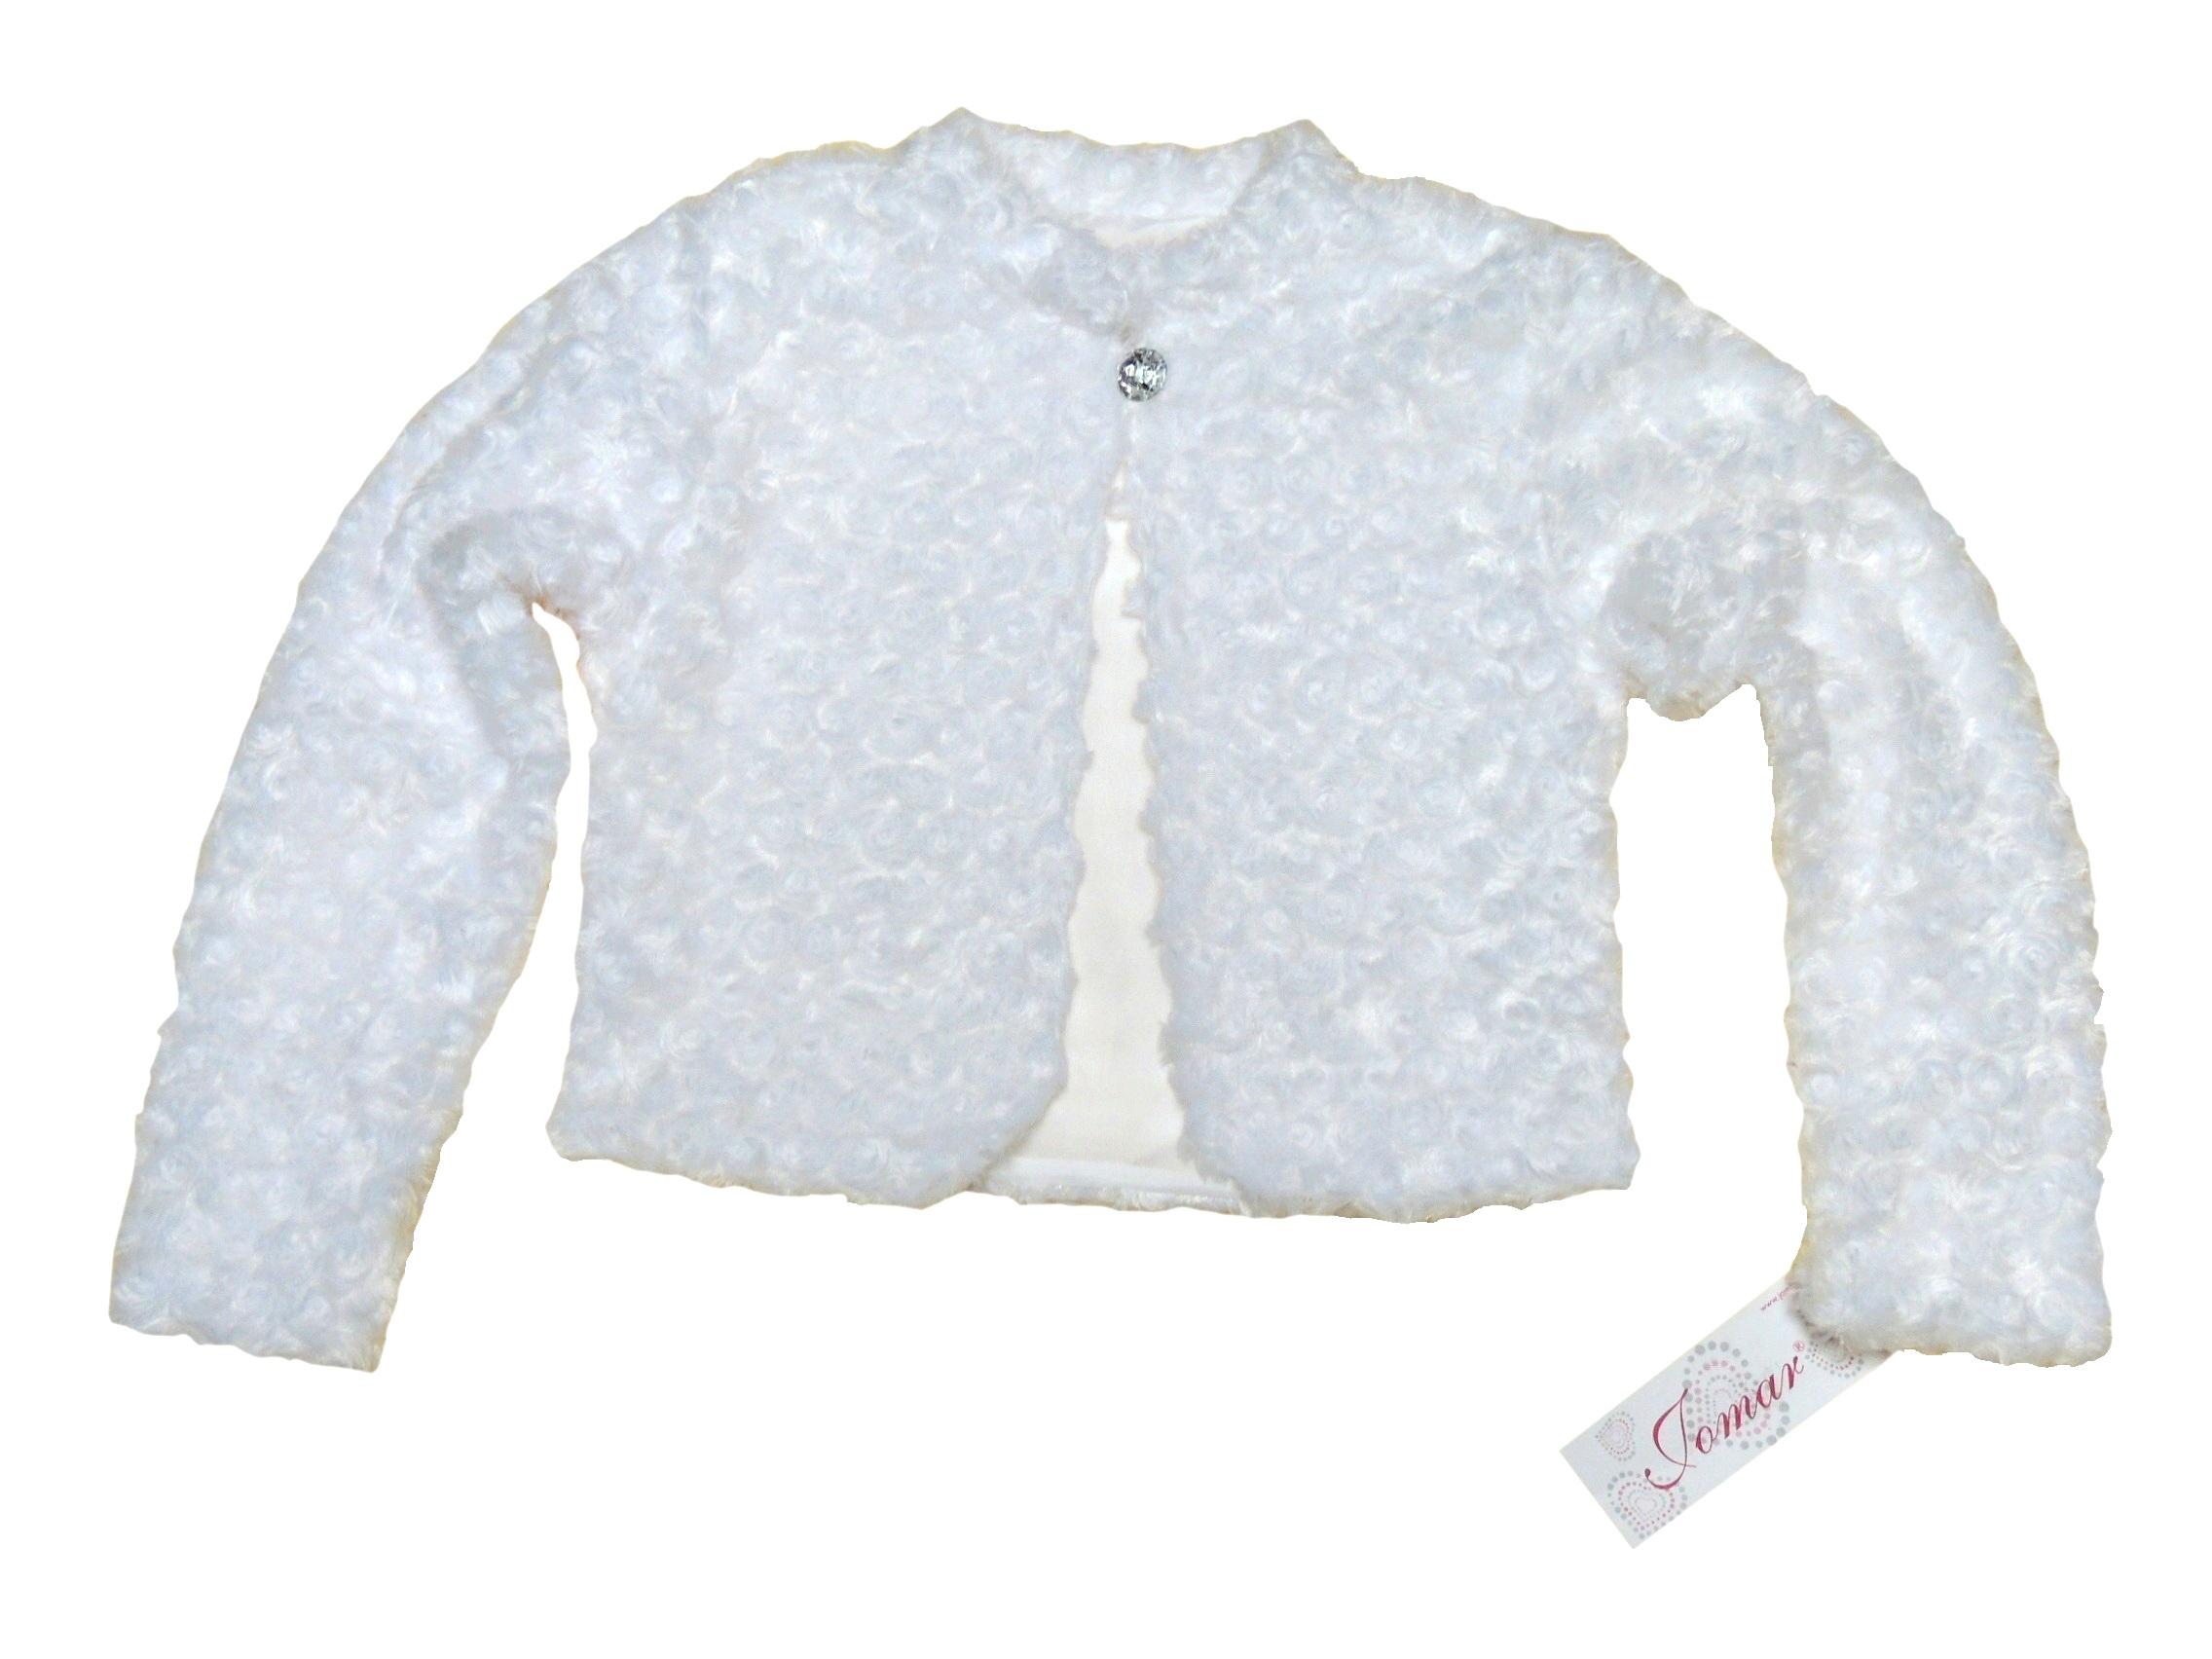 JOMAR biele Bolero futerkowe rubeole 134 B